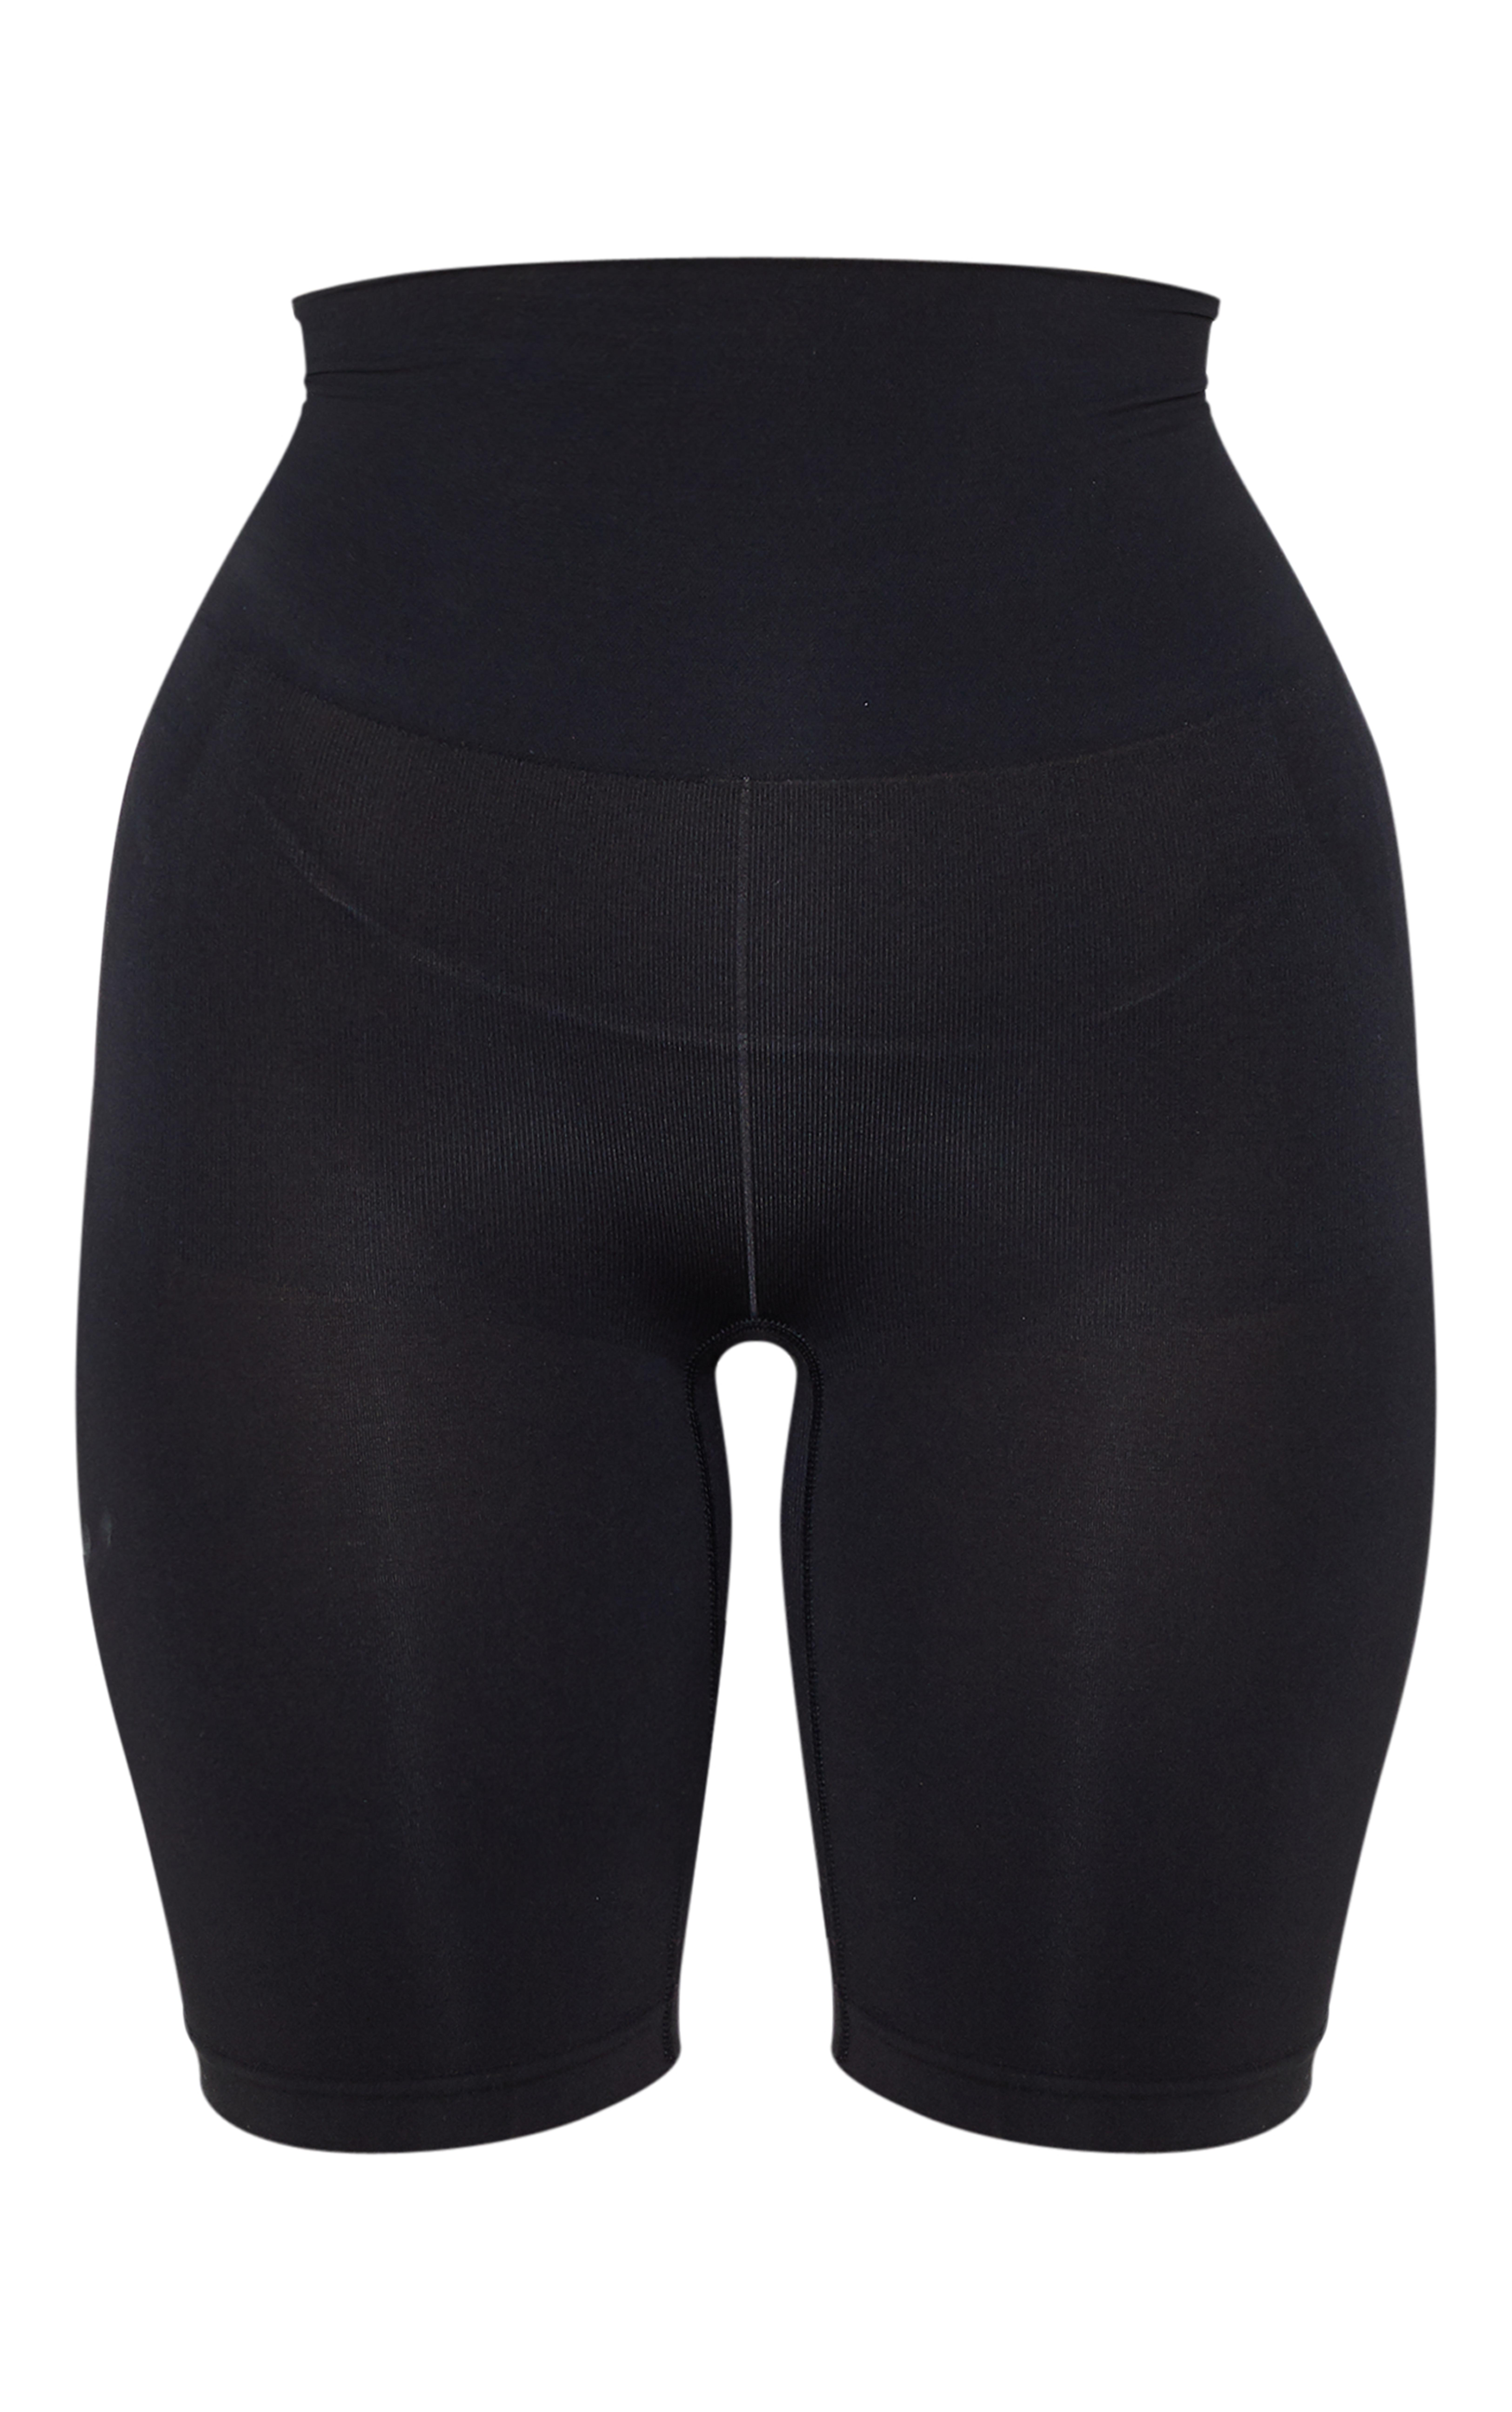 Black Bum Lift High Waist Shapewear Control Short 3